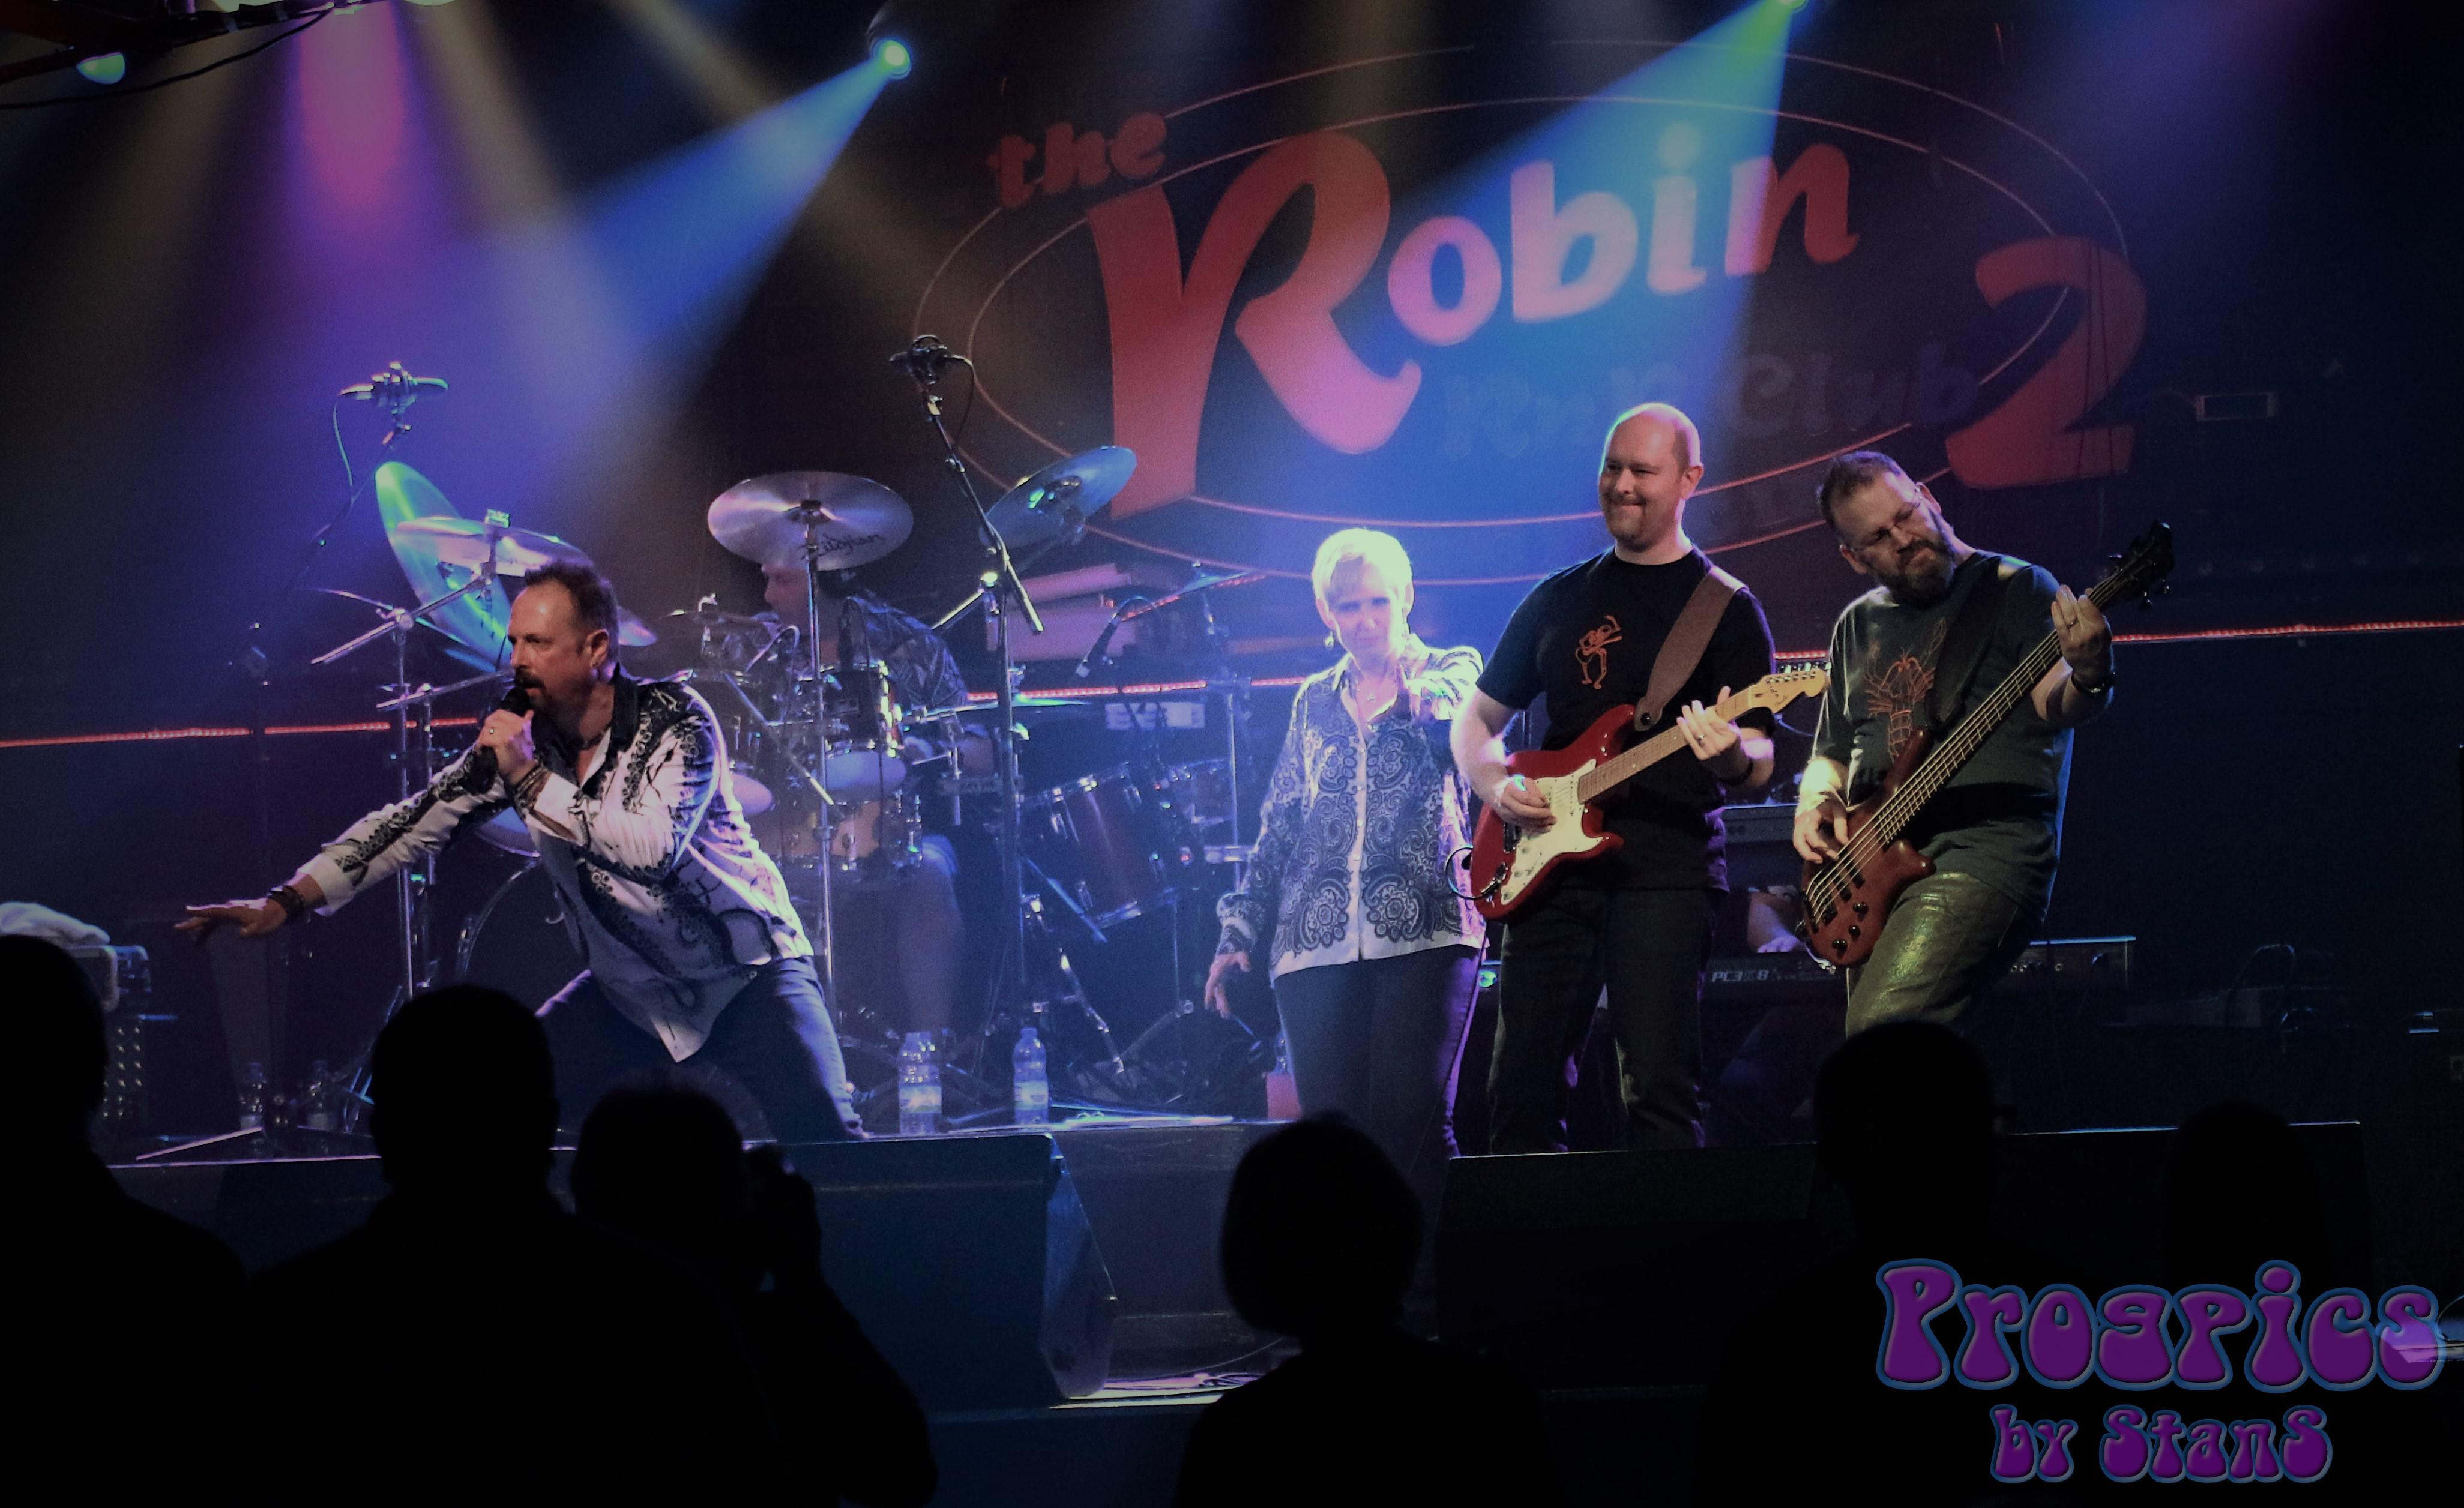 Strangefish at Robin, Bilston 5th May 20